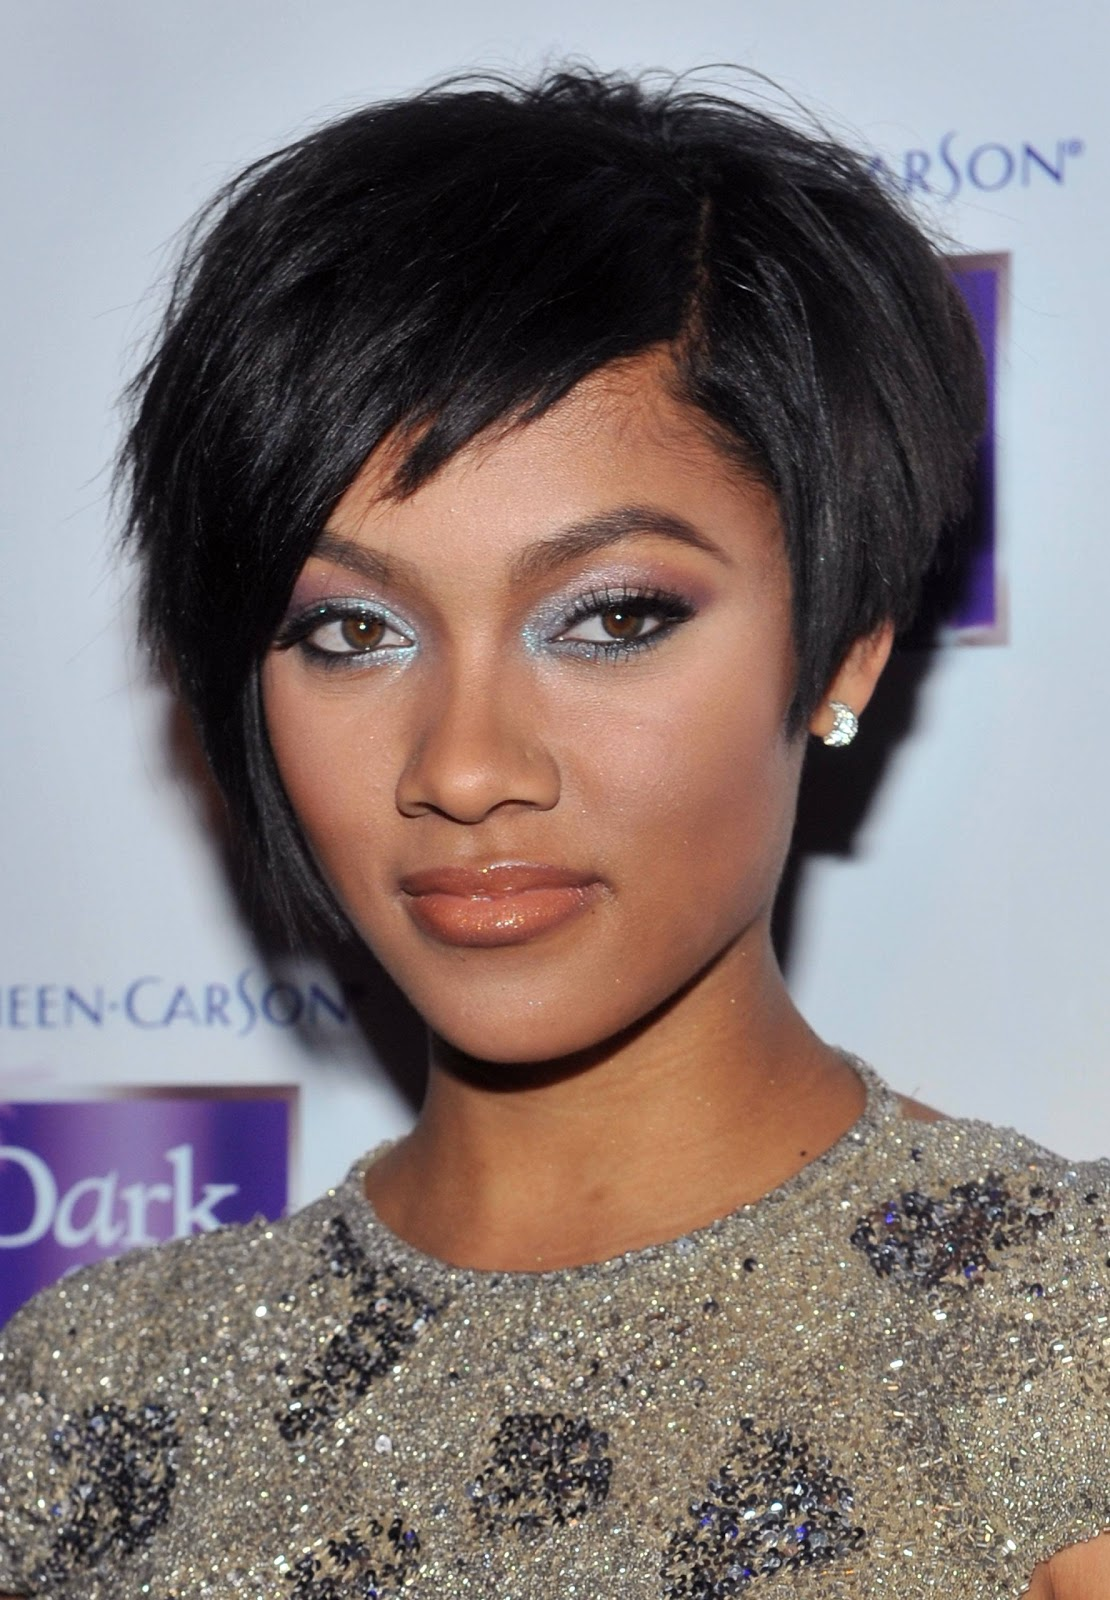 Hairstyles: Short Black Hair Cuts